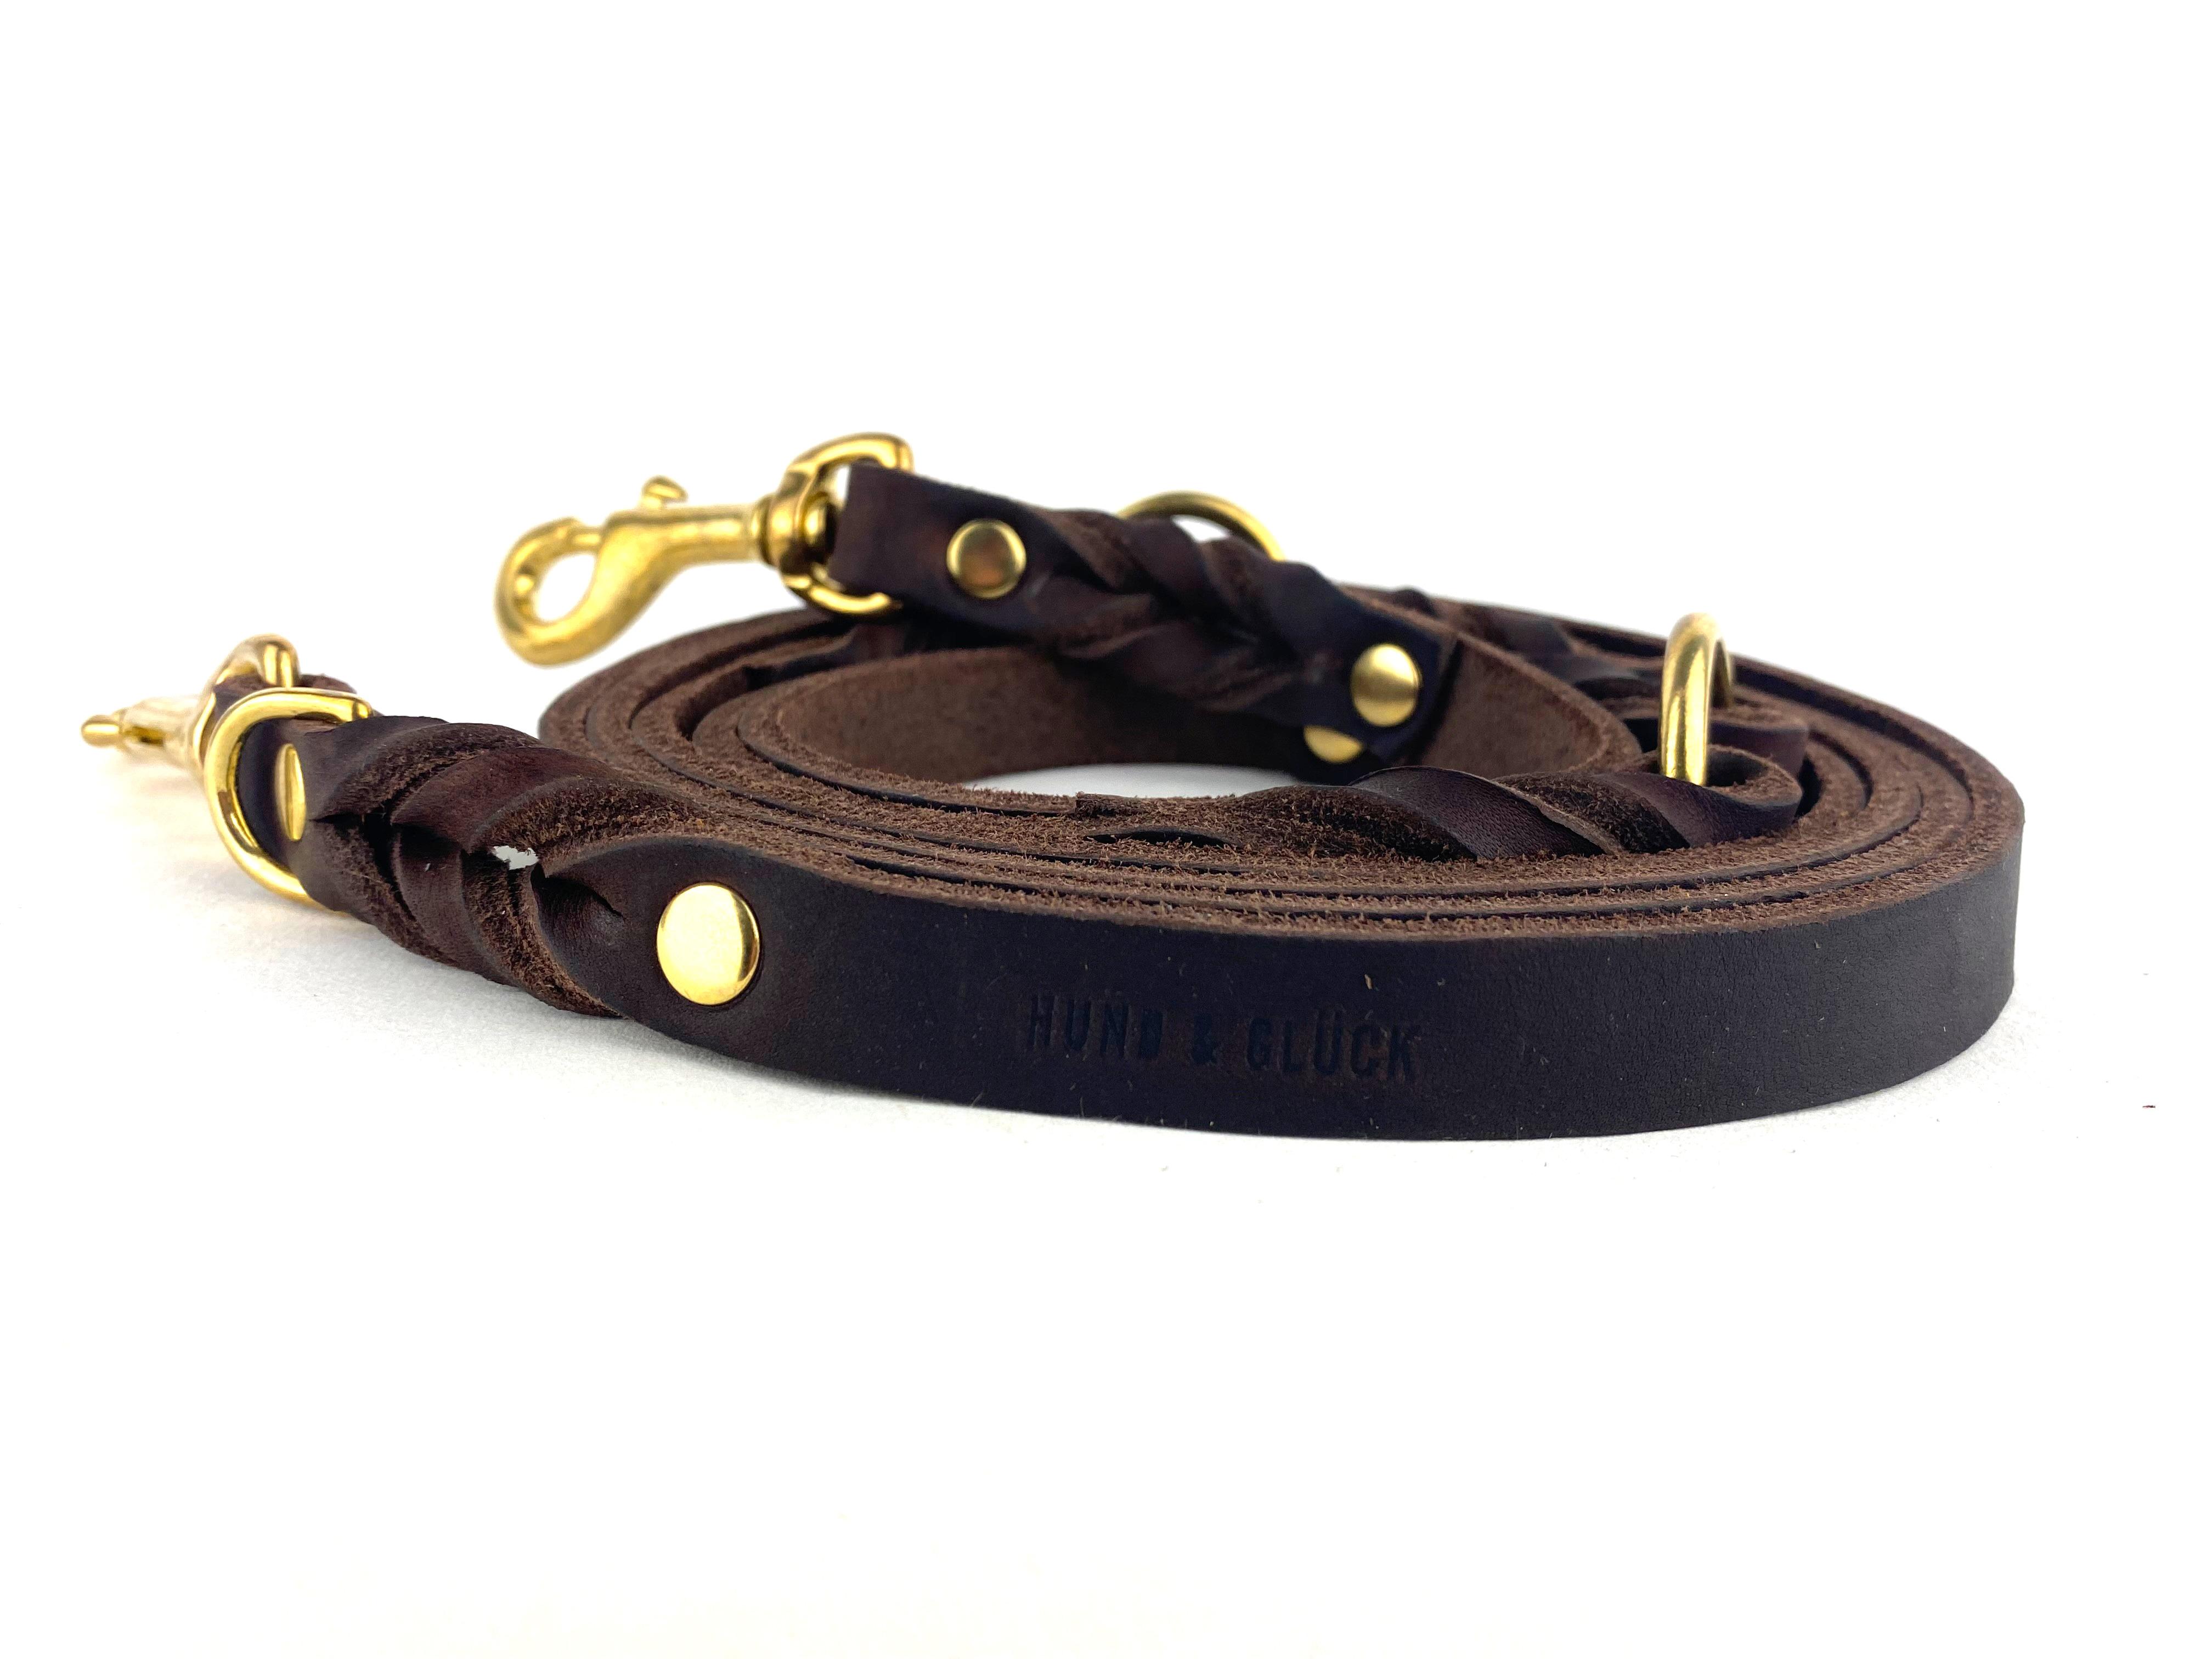 Hundeleine HundundGlück Puppy Leder Classic Brown 240cm 3fach verstellbar